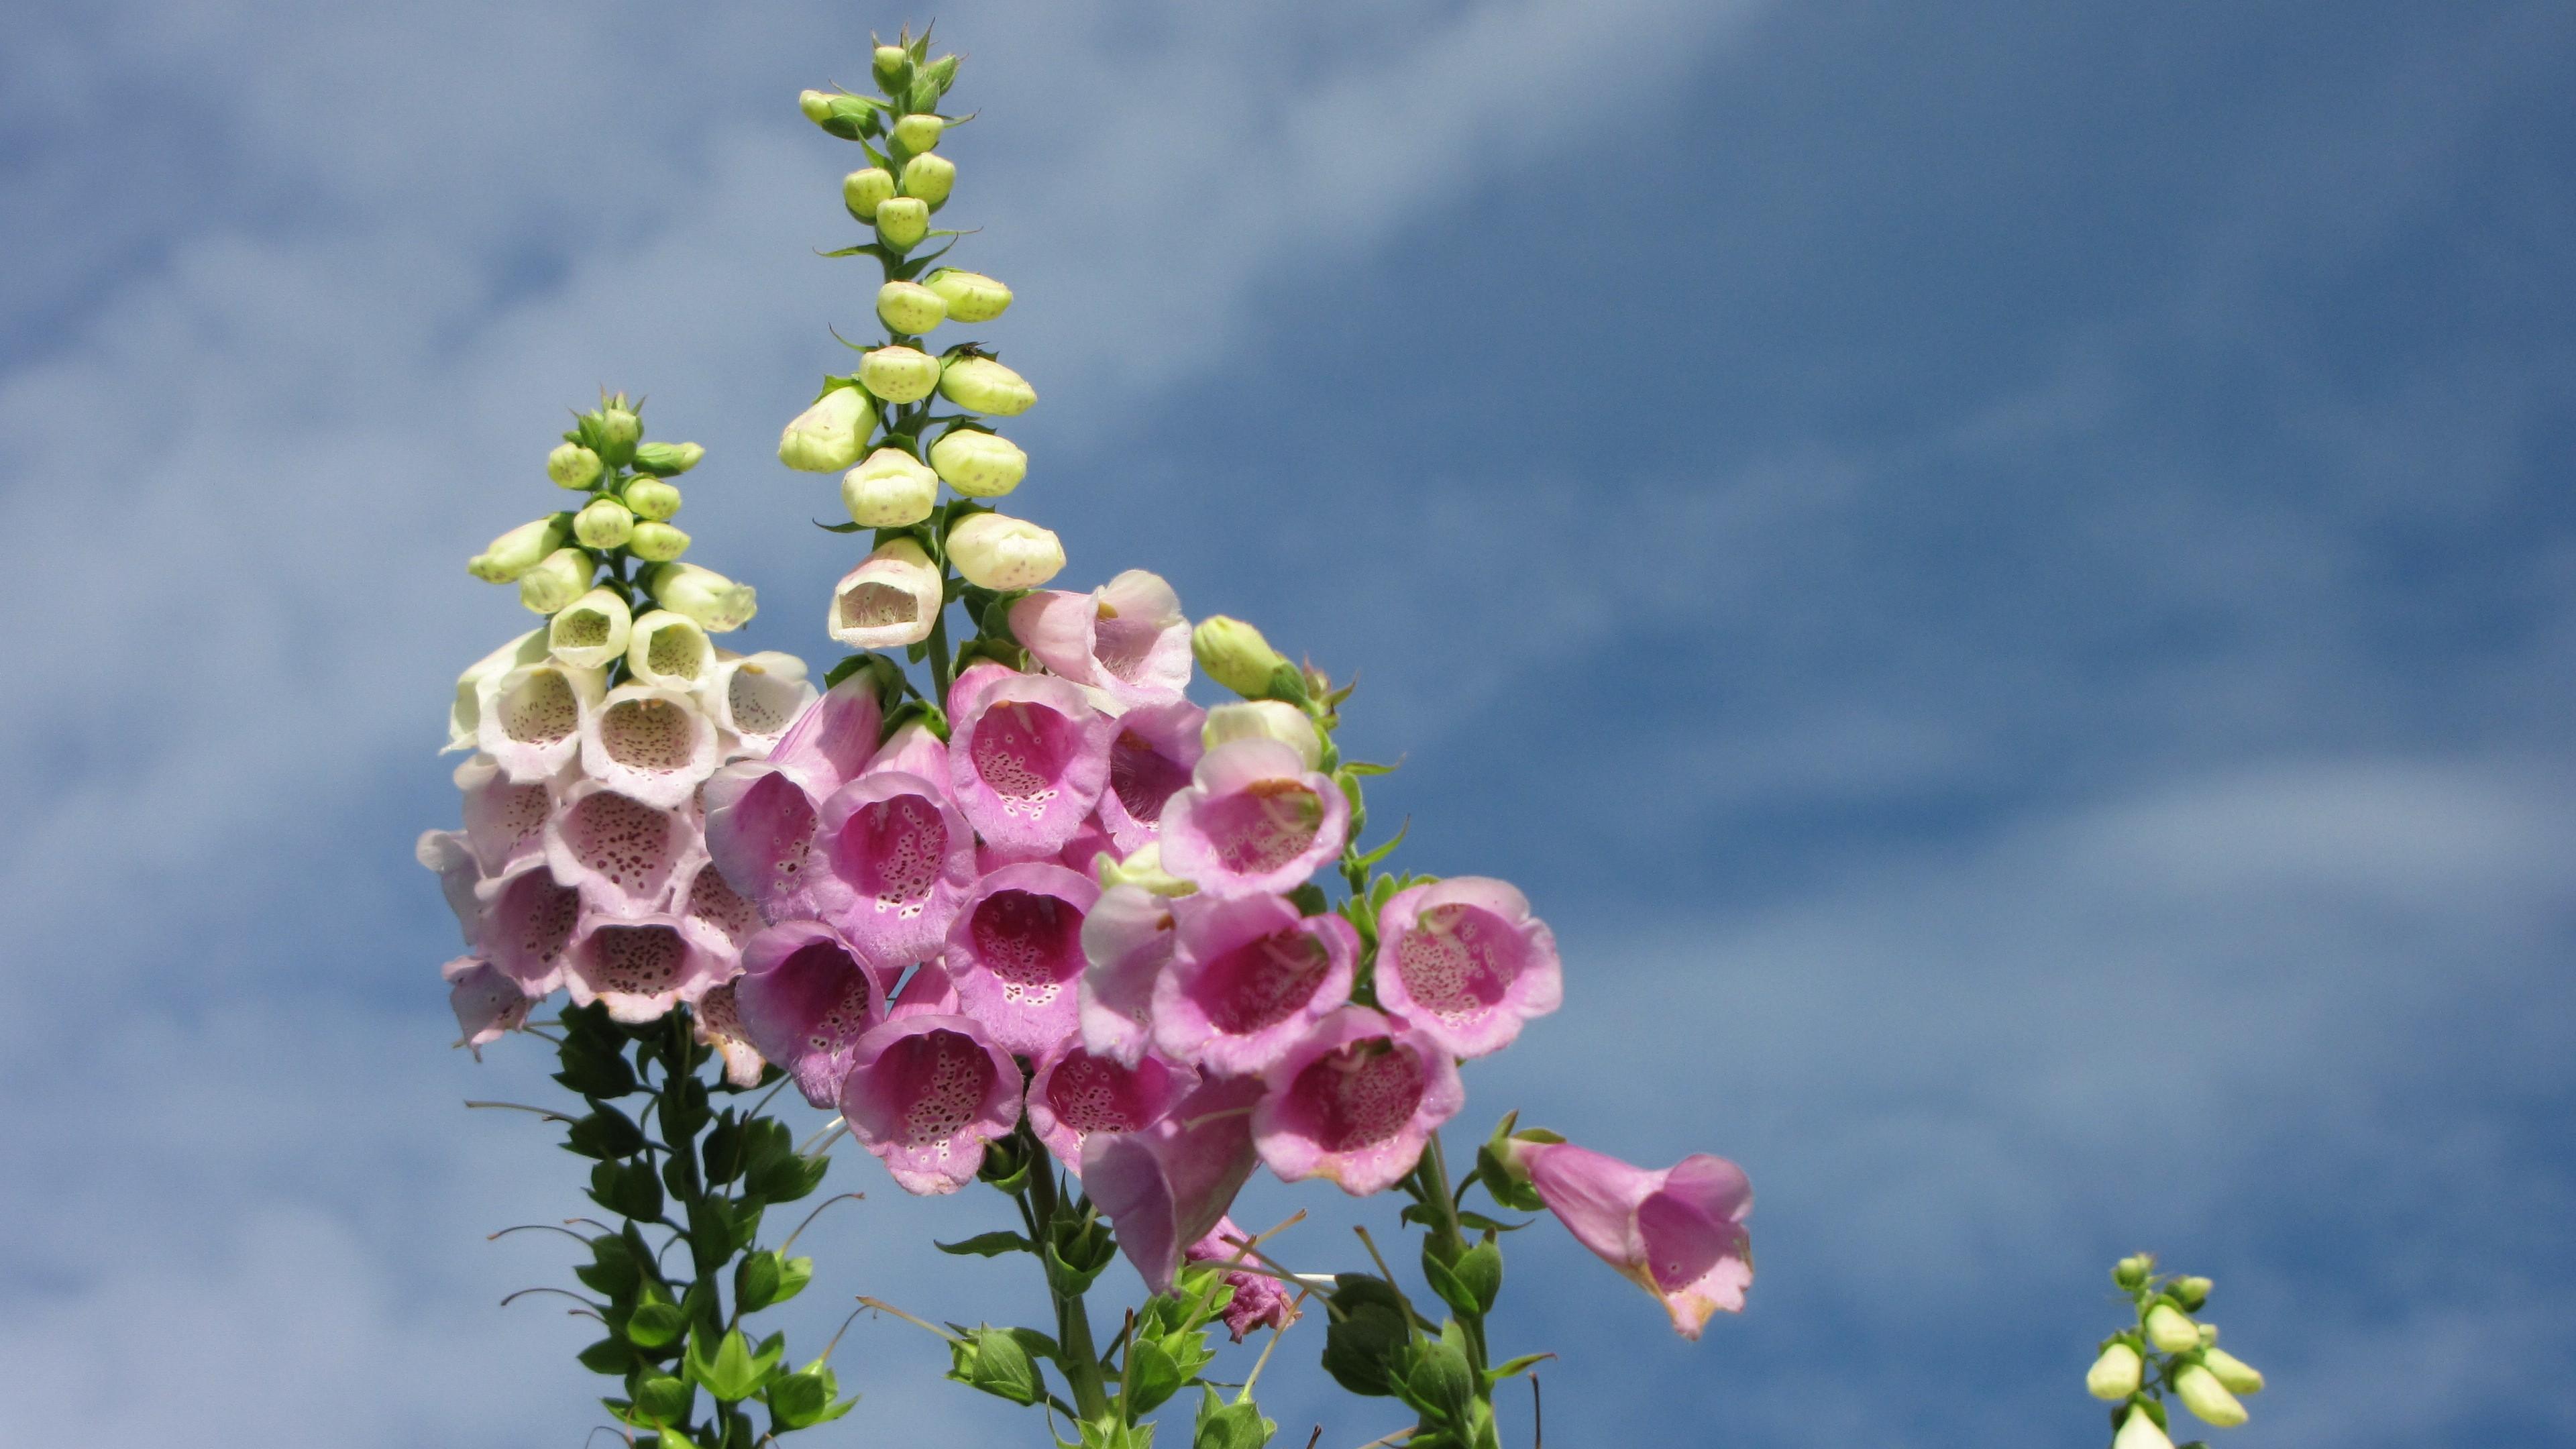 Flower Pink Happy Day Bluesky Garden Wallpaper Desktop - Digitalis , HD Wallpaper & Backgrounds